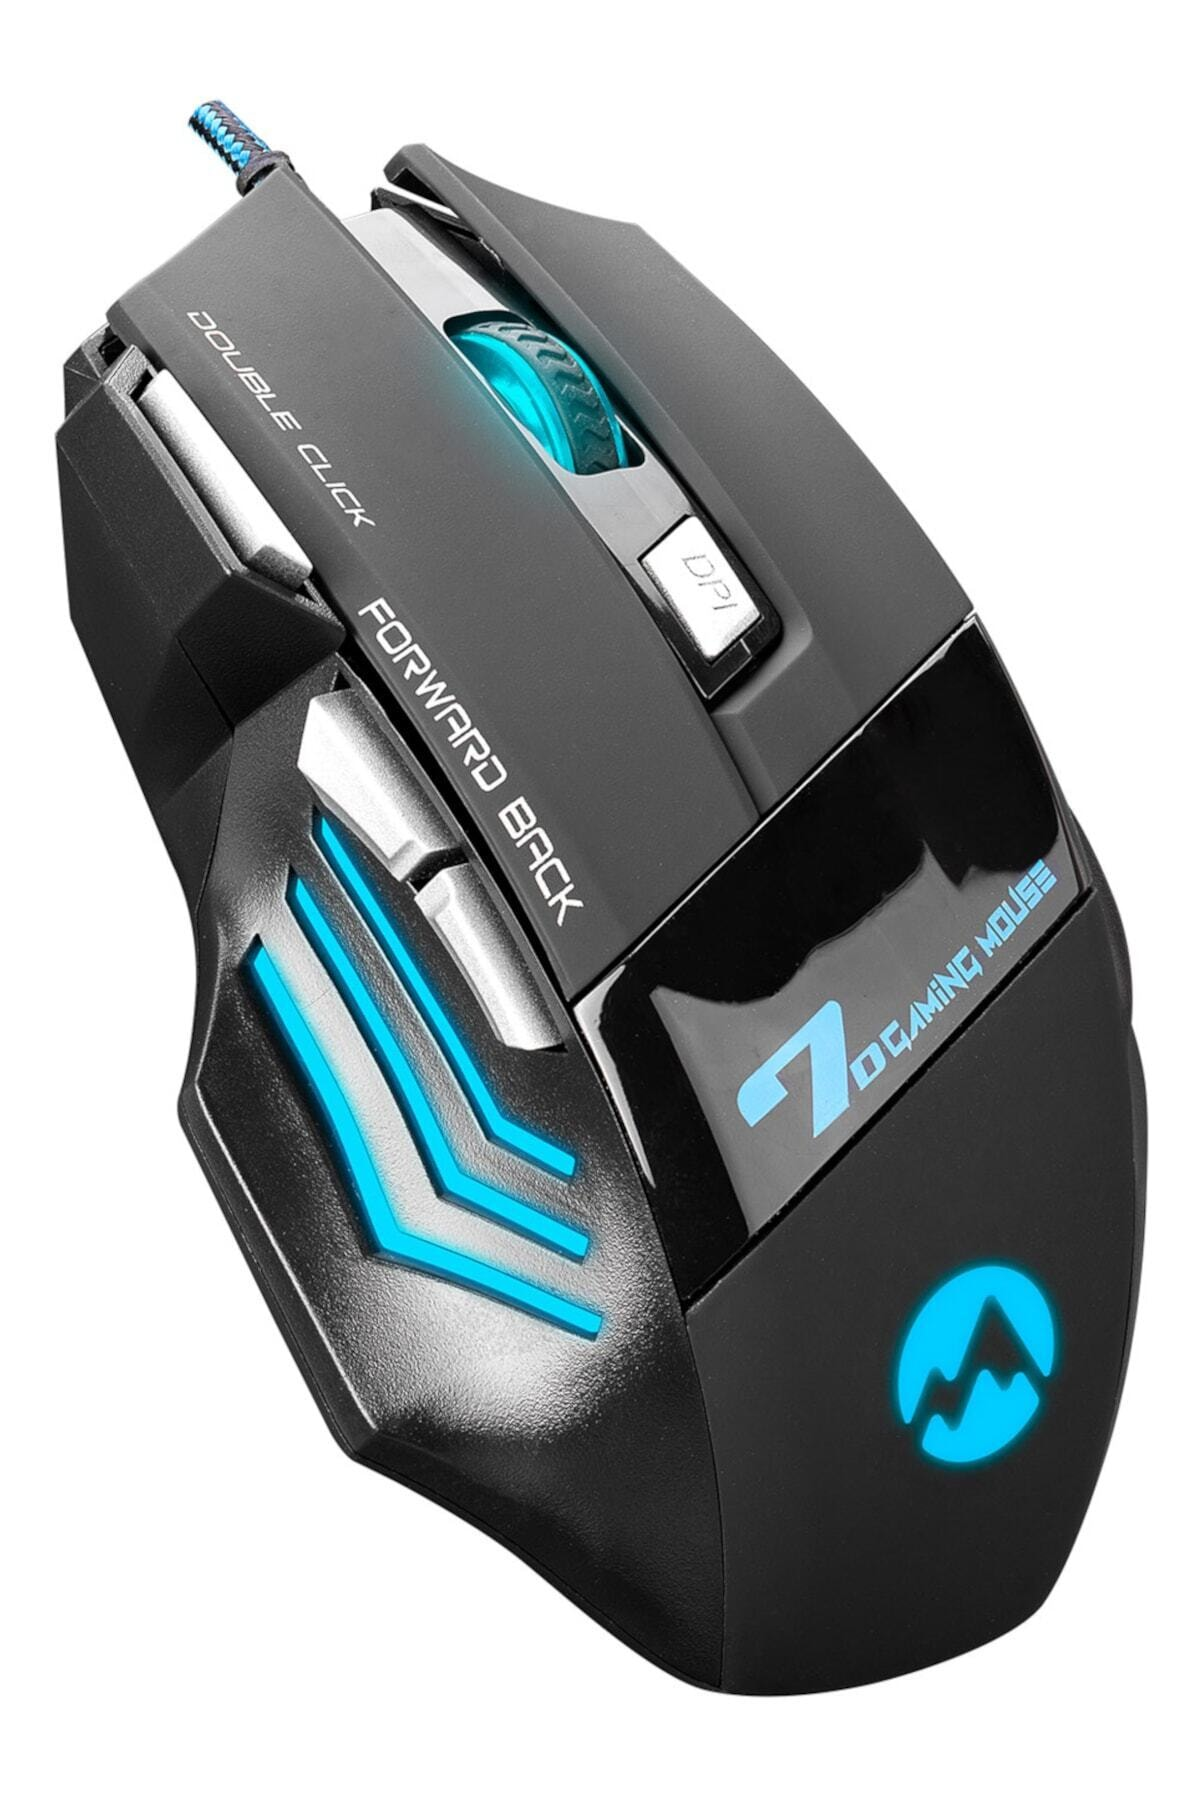 Sm-770 Chopper Usb Siyah Oyun Gaming Oyuncu Mouse